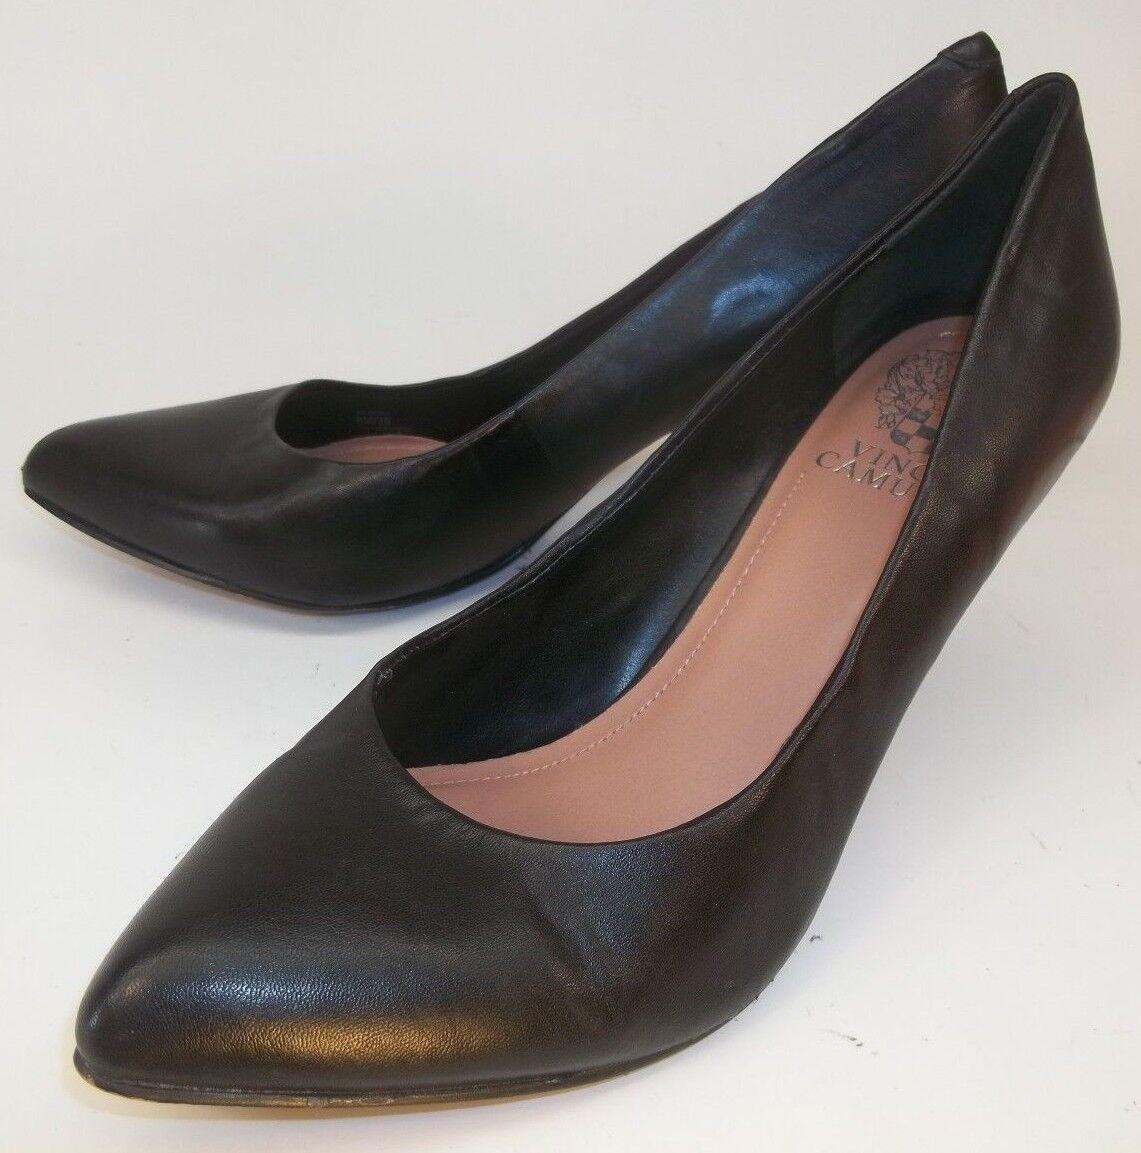 VINCE CAMUTO VICKIY Wo's US 8 M Black Leather Slip-On Heels Dress Work Shoes